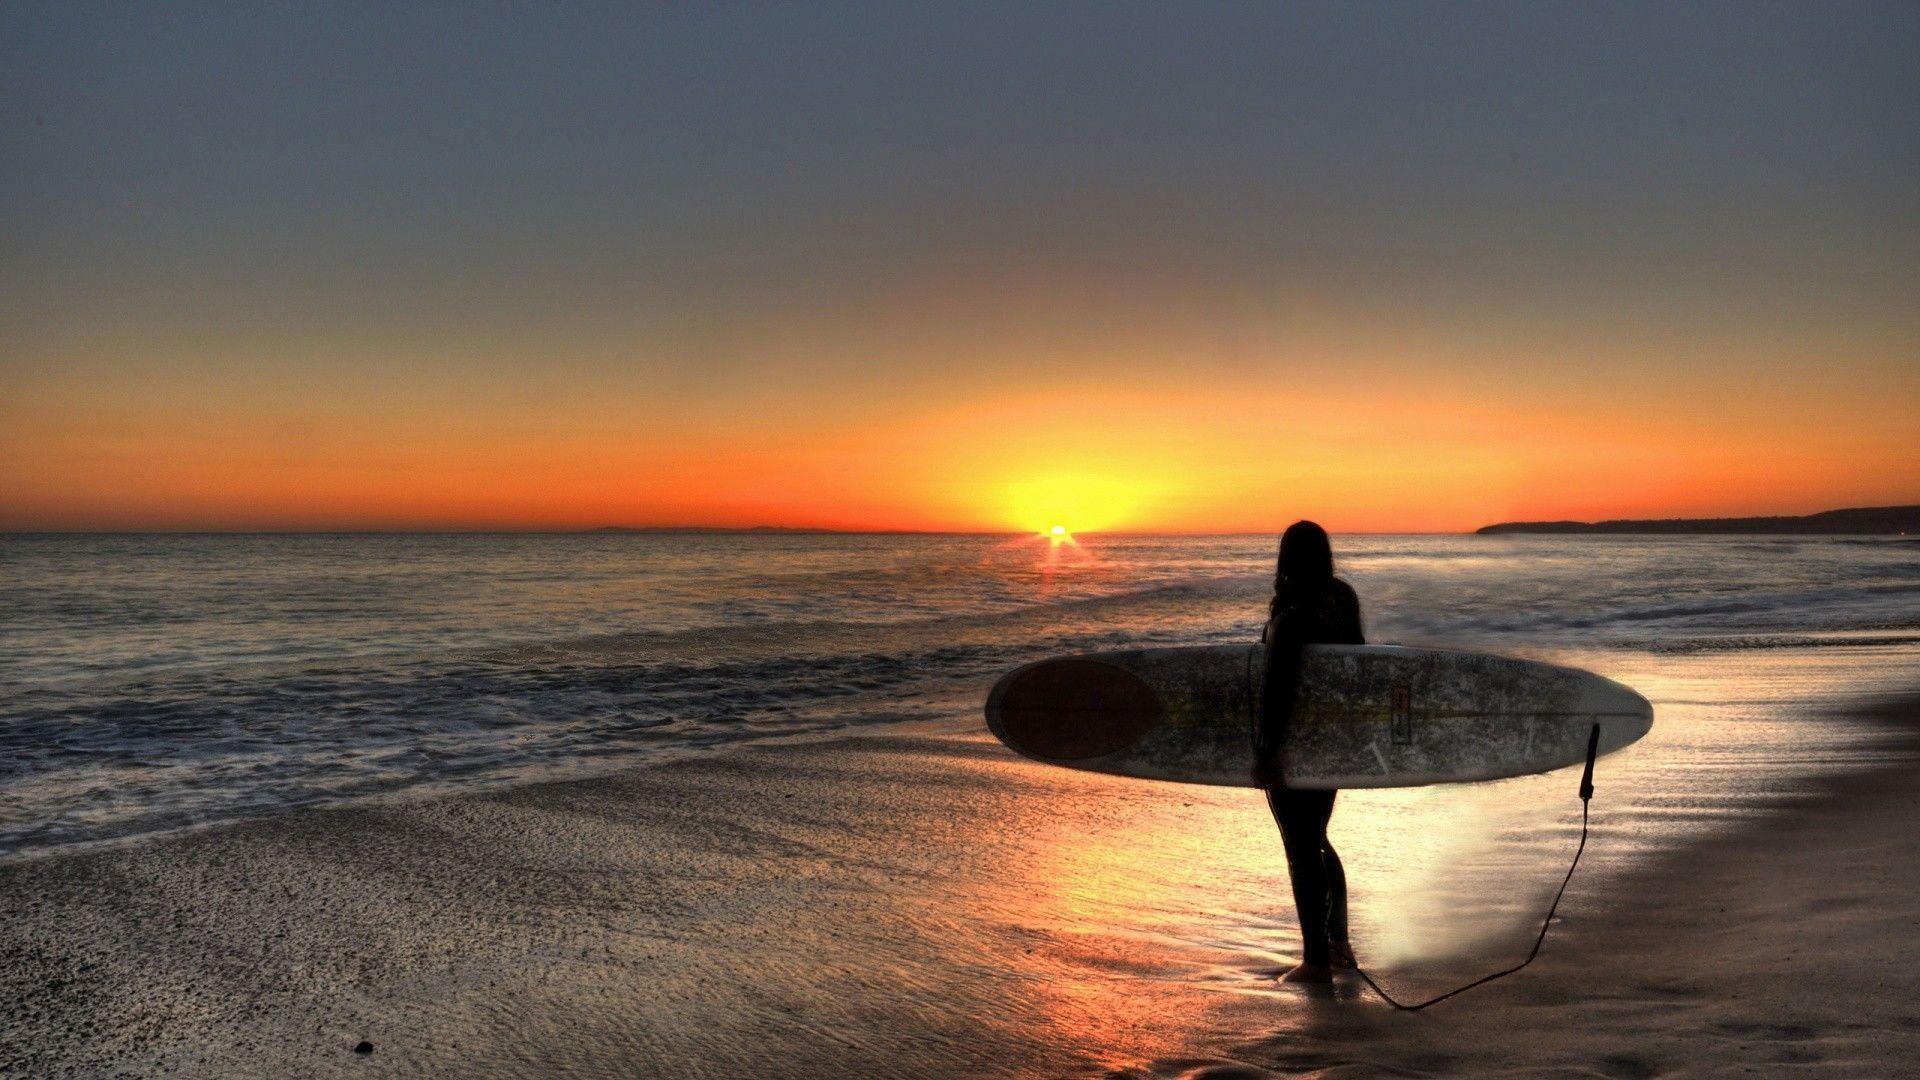 wallpaper.wiki-Surf-Beach-Wallpaper-Free-Download-PIC-